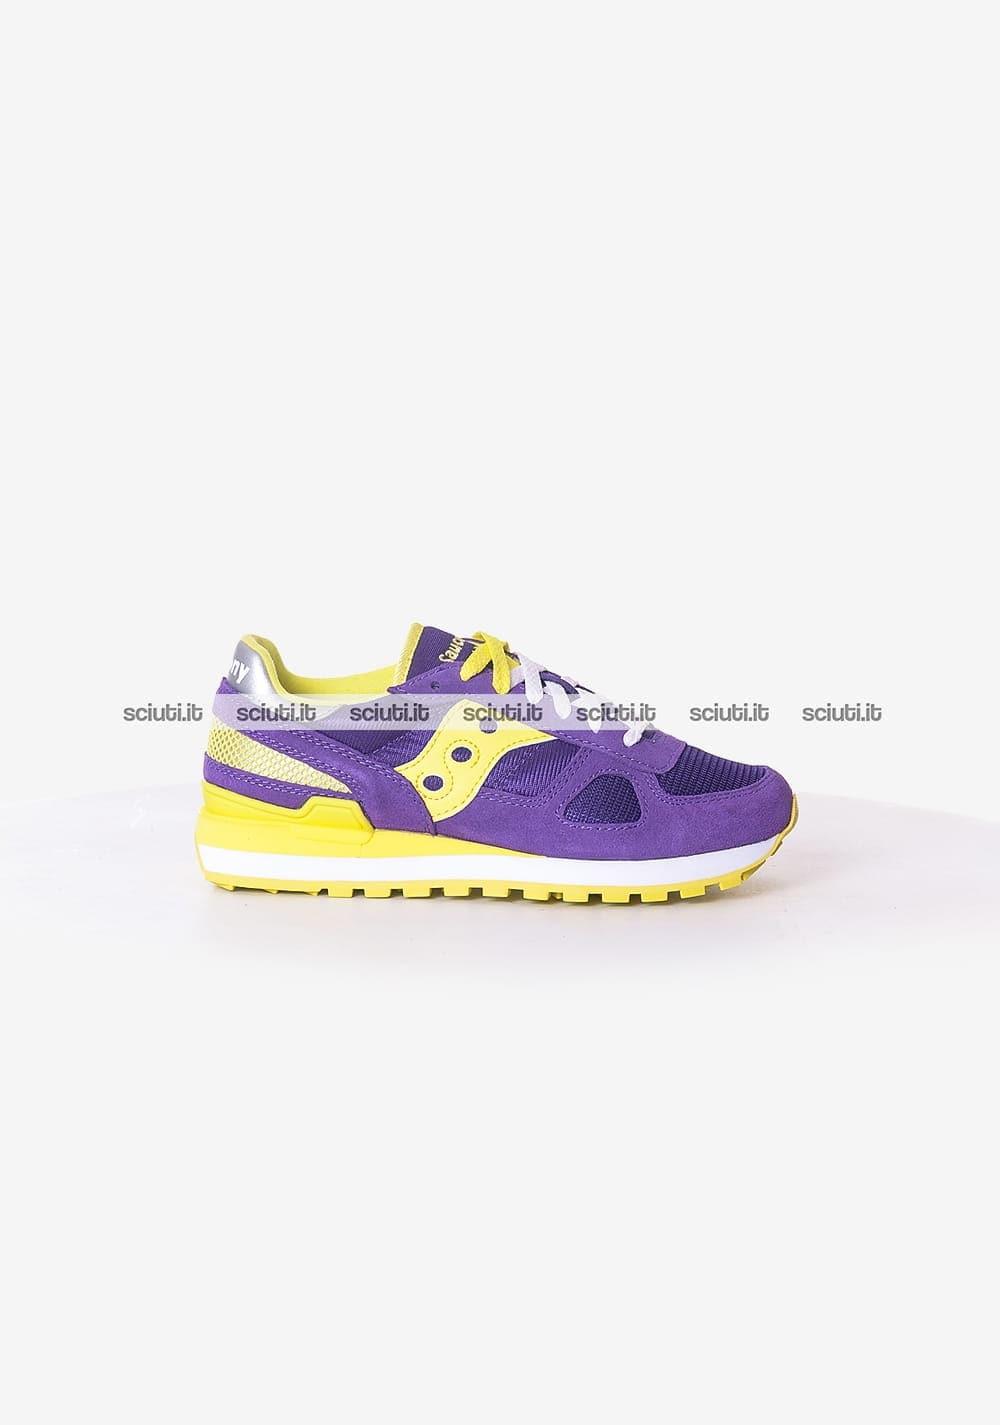 Scarpe Saucony donna Shadow viola giallo | Sciuti.it